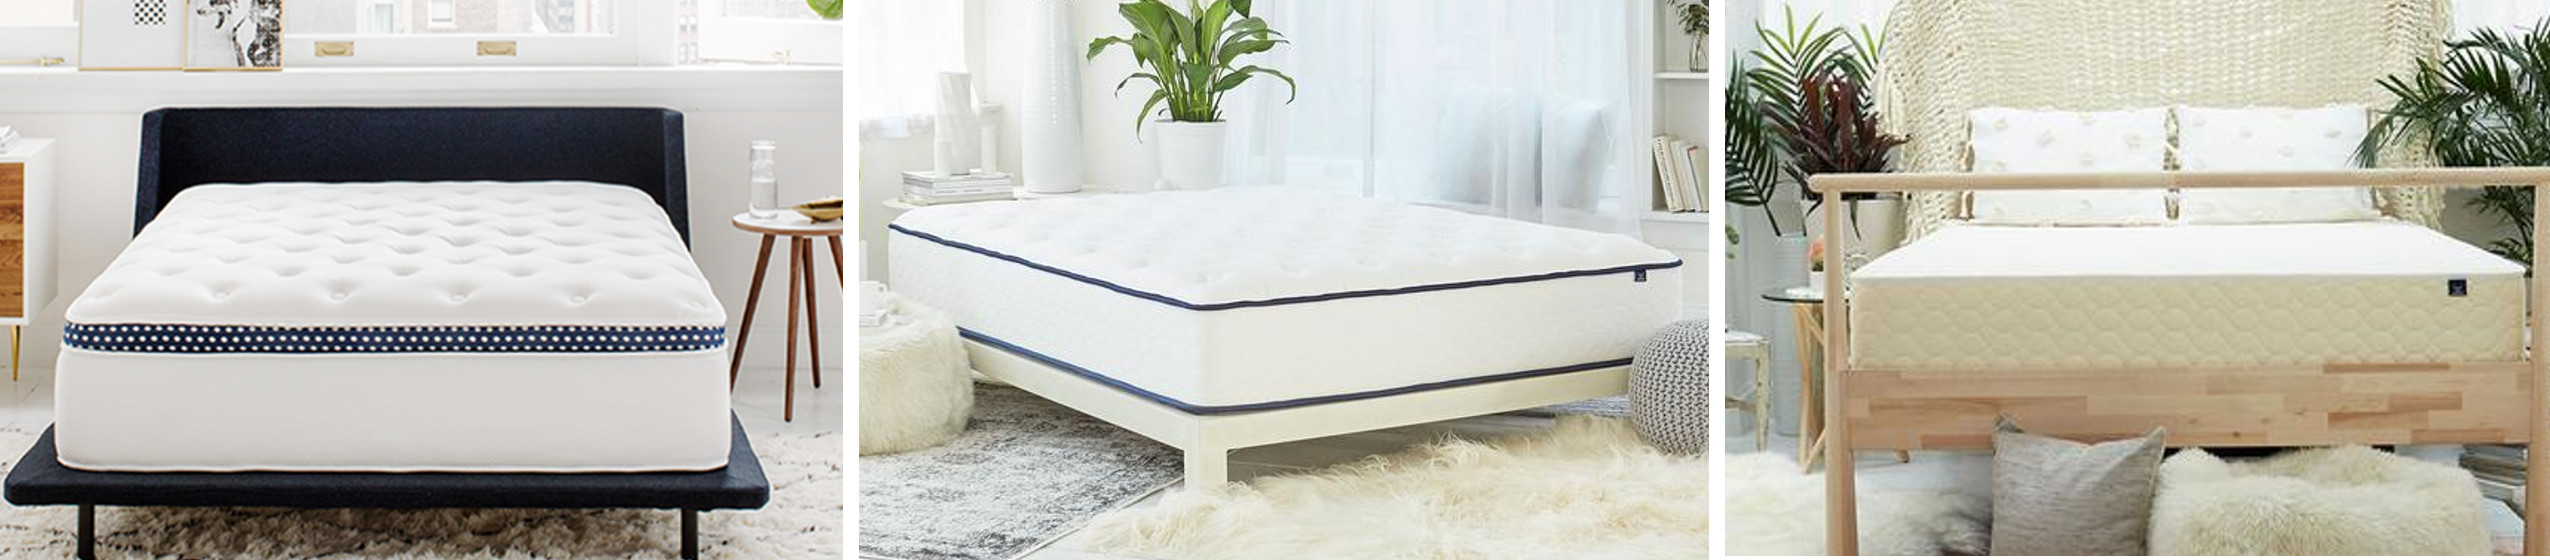 winkbeds mattresses